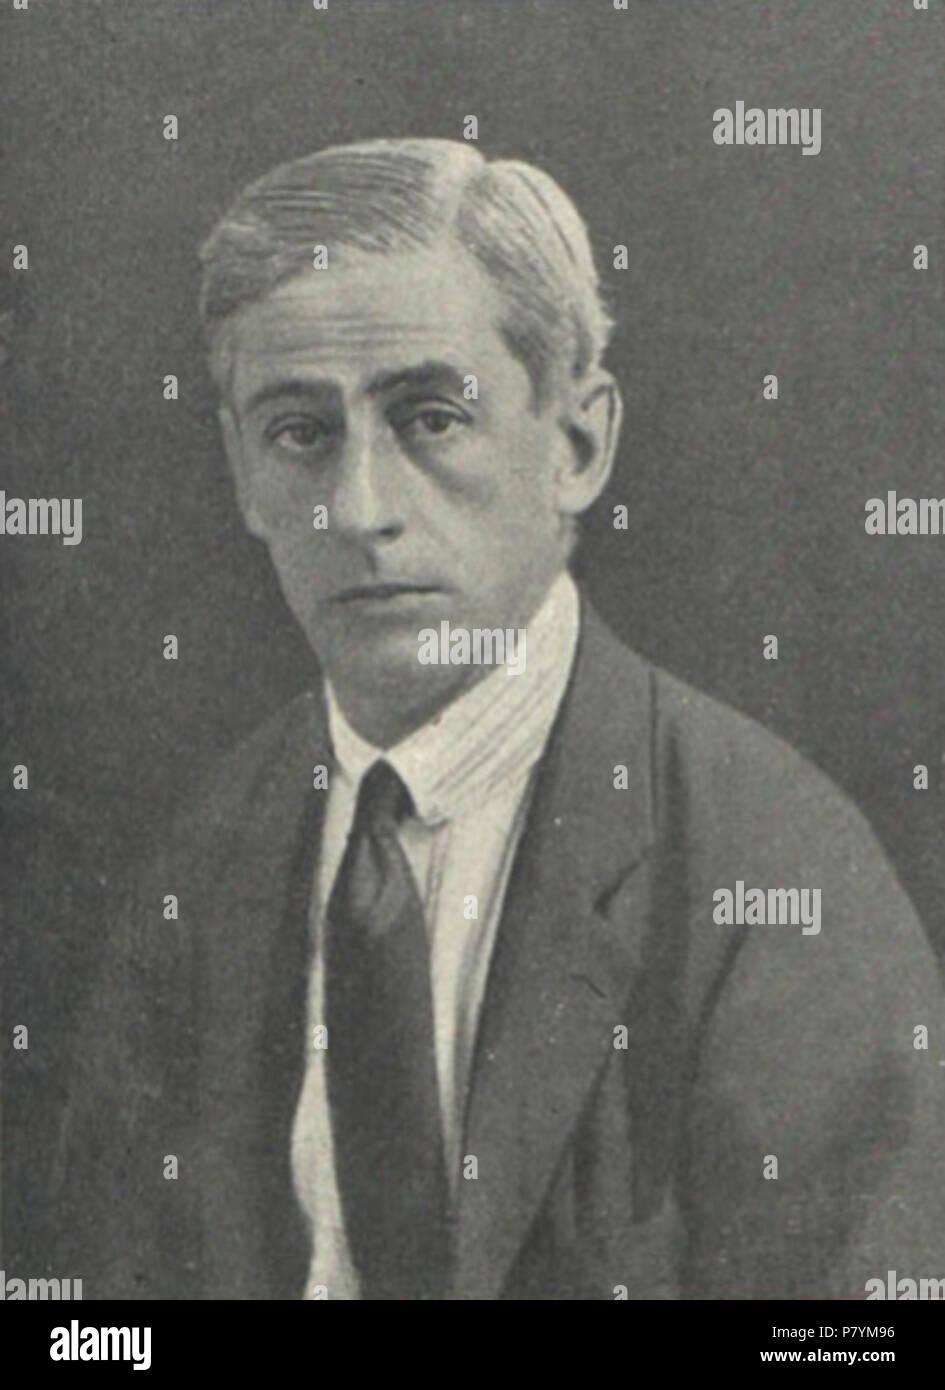 223 José Bertrán y Musitu - Stock Image